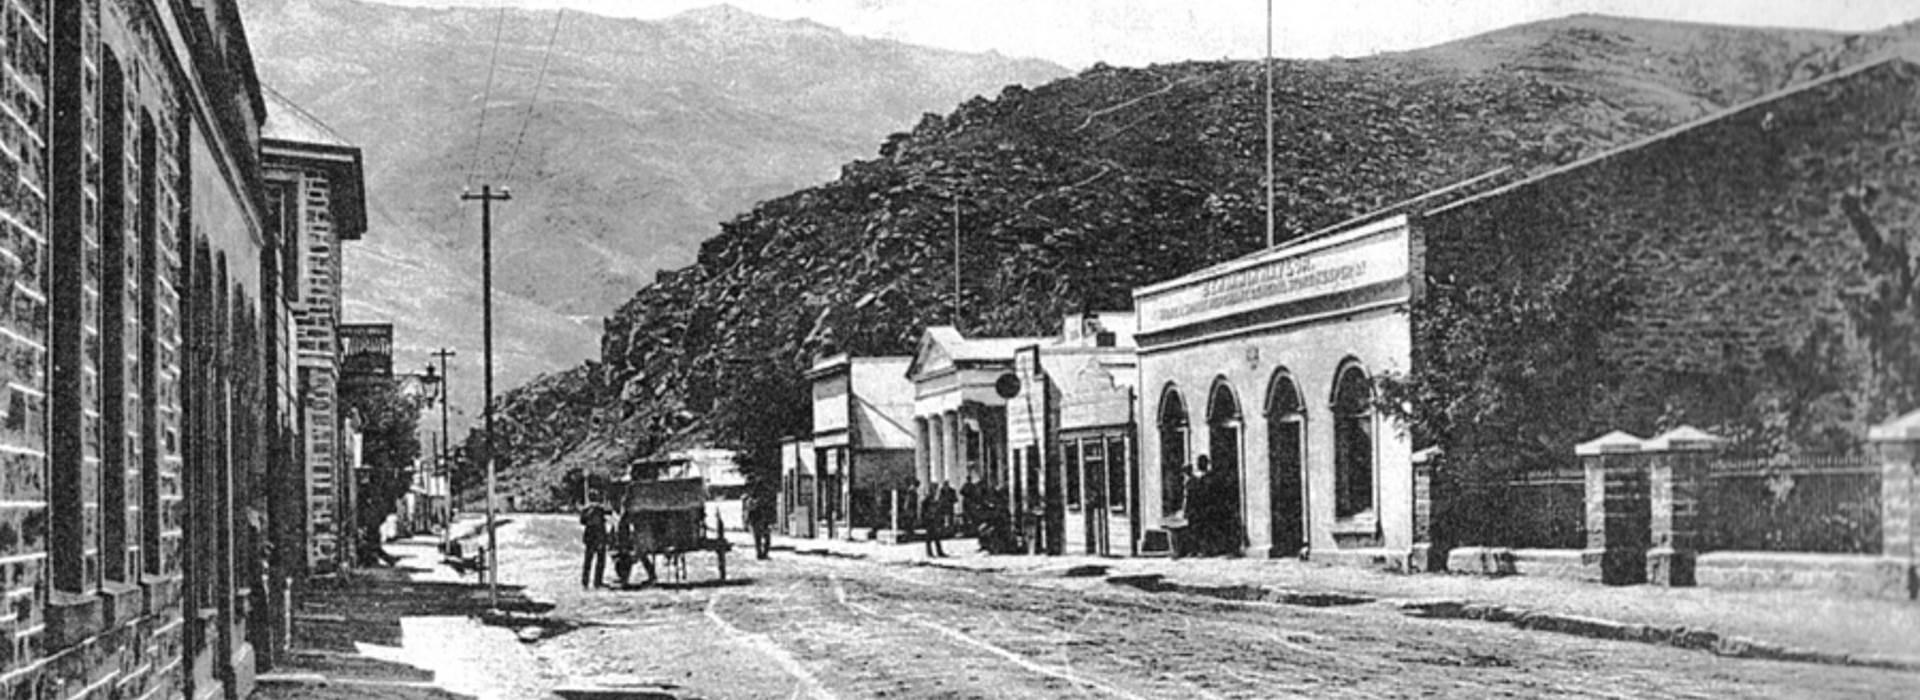 Sunderland Street, Clyde Central Otago